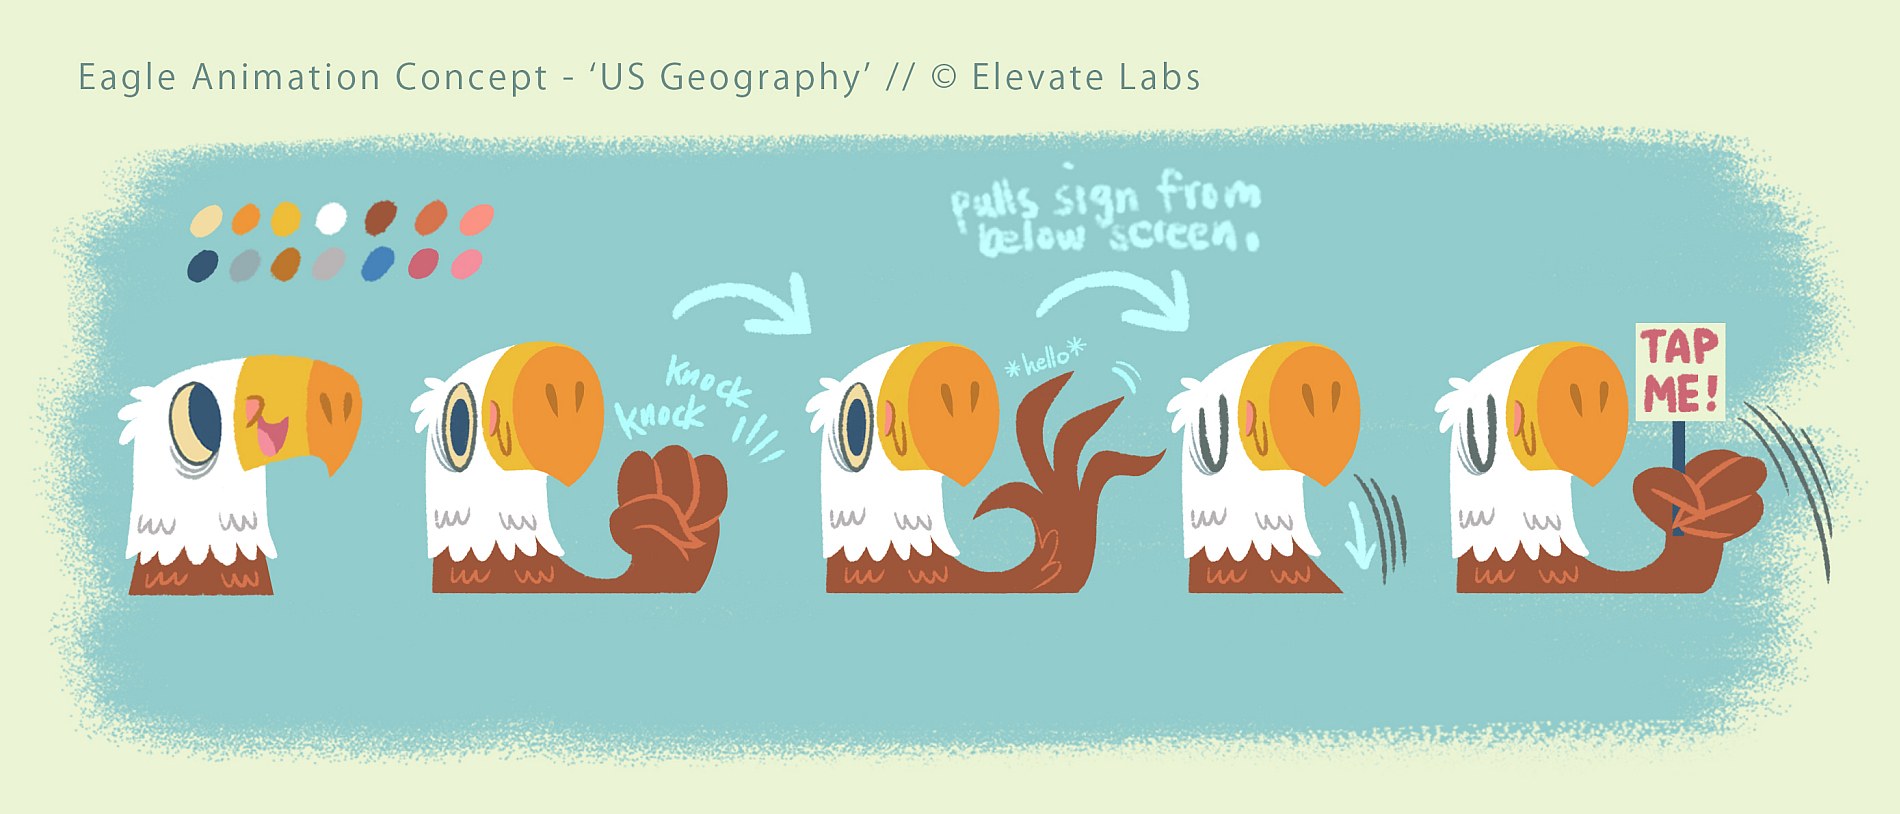 Mascot Idle Animation Concept